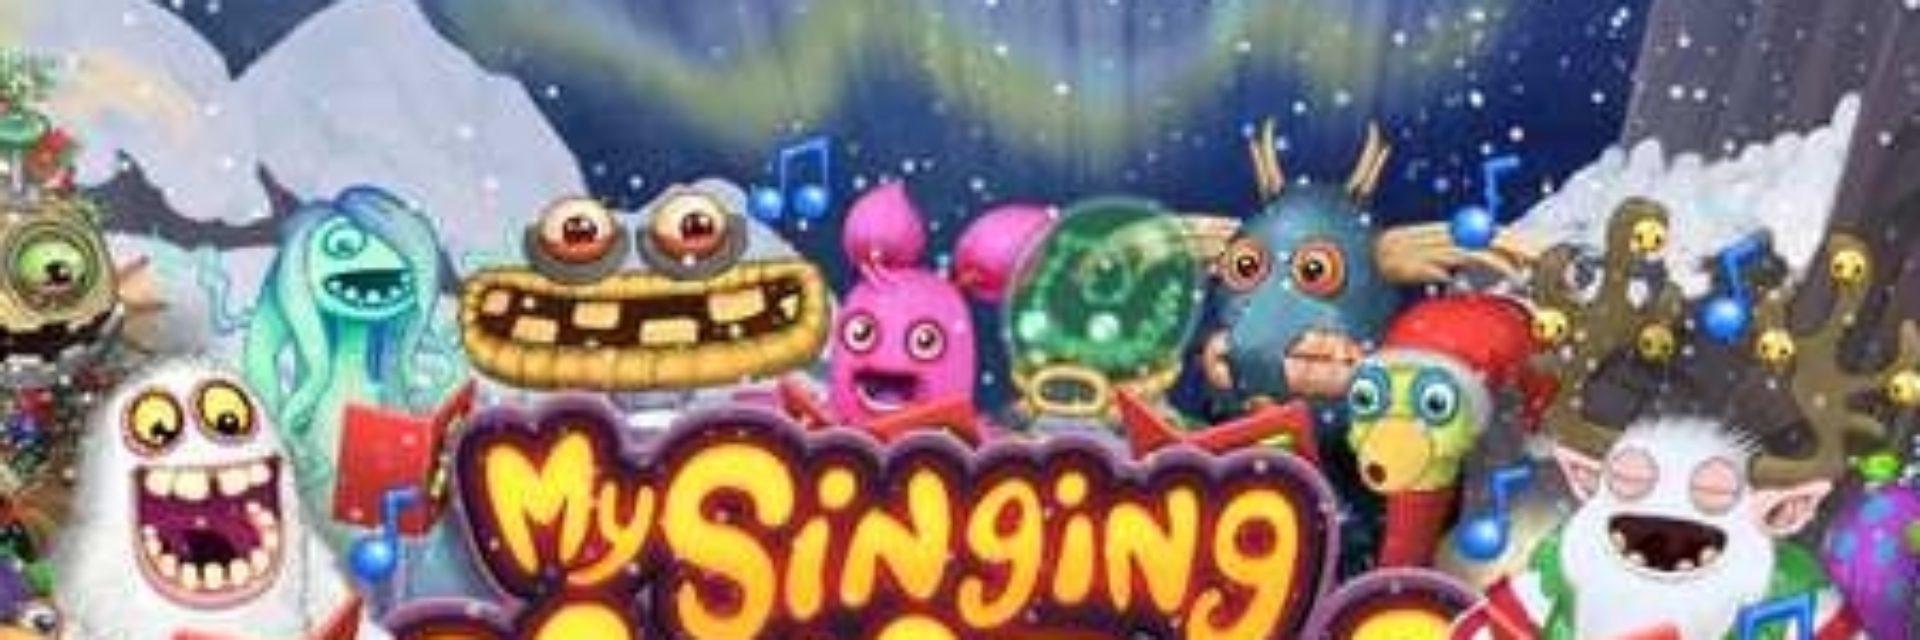 cropped-vzlomannyj-my-singing-monsters-1.jpg